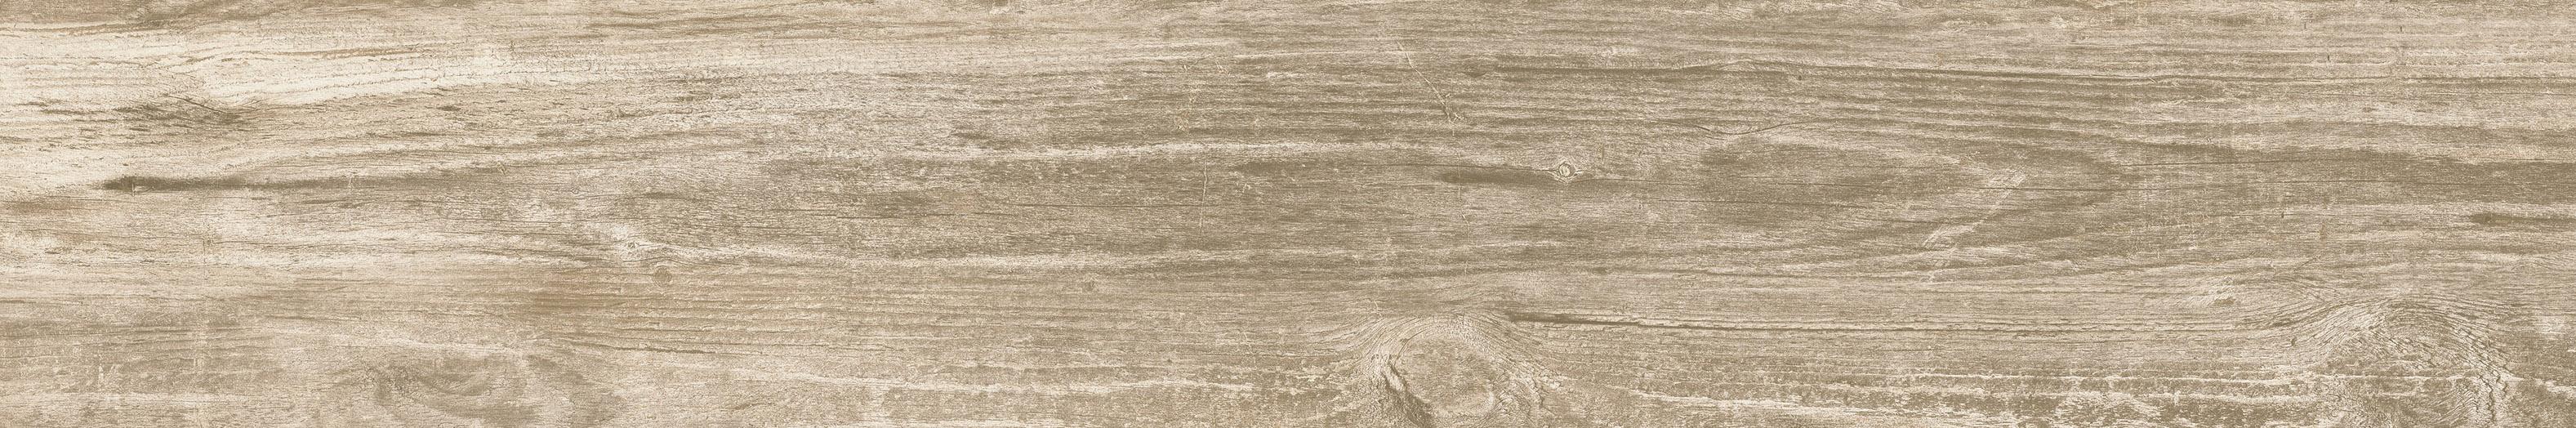 0591351, Artwood, Beige, lattia,pakkasenkesto,liukastumisenesto